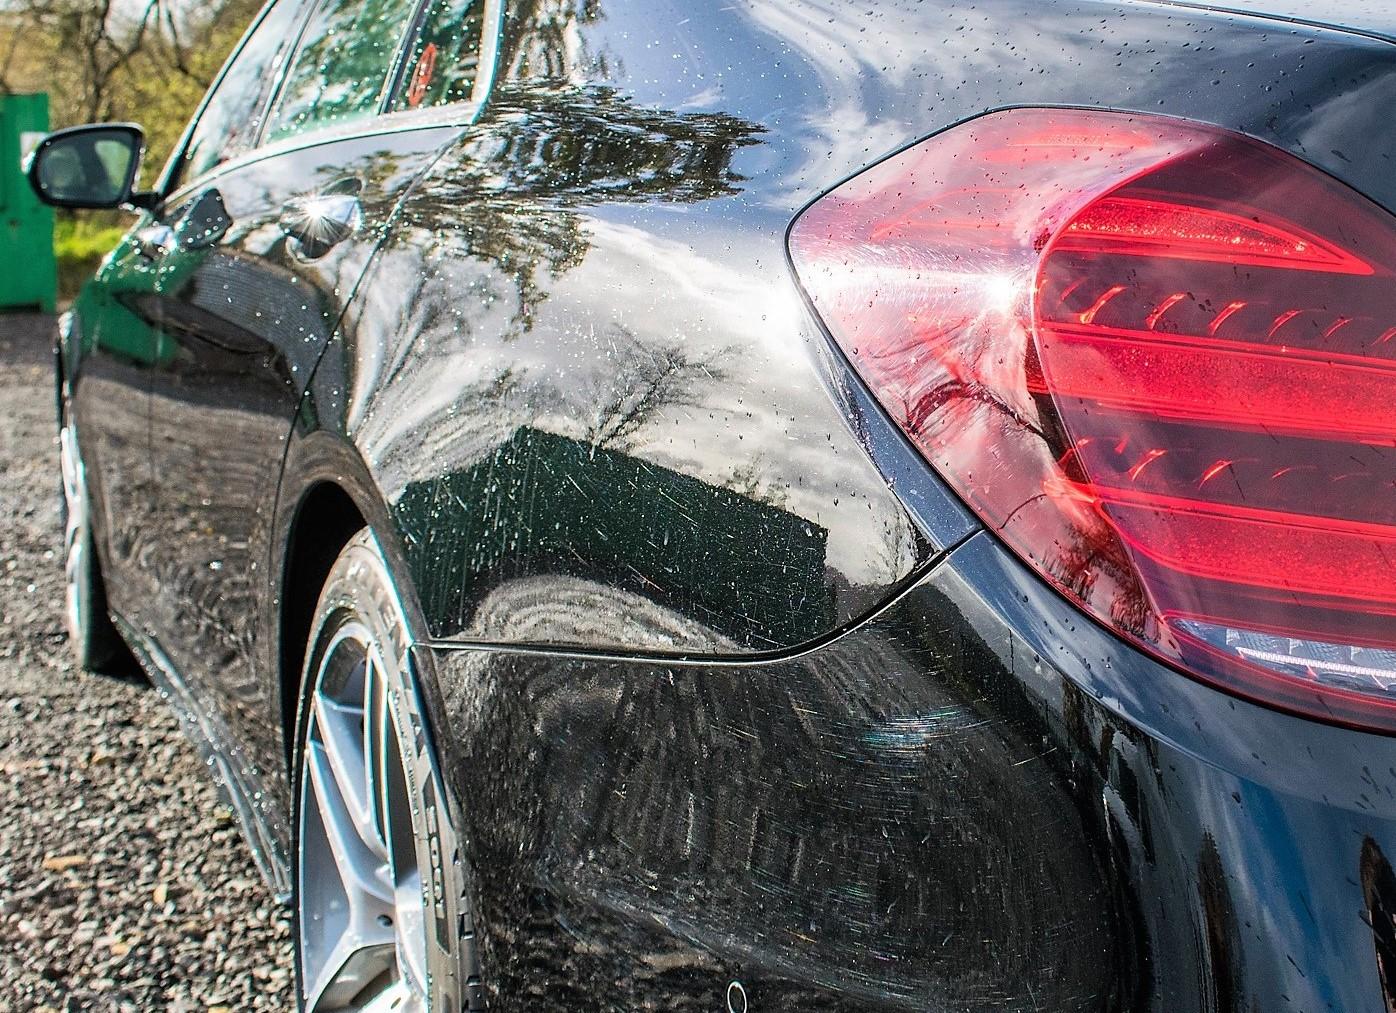 Mercedes Benz S450 L AMG Line Executive auto petrol 4 door saloon car Registration Number: FX68 - Image 11 of 30